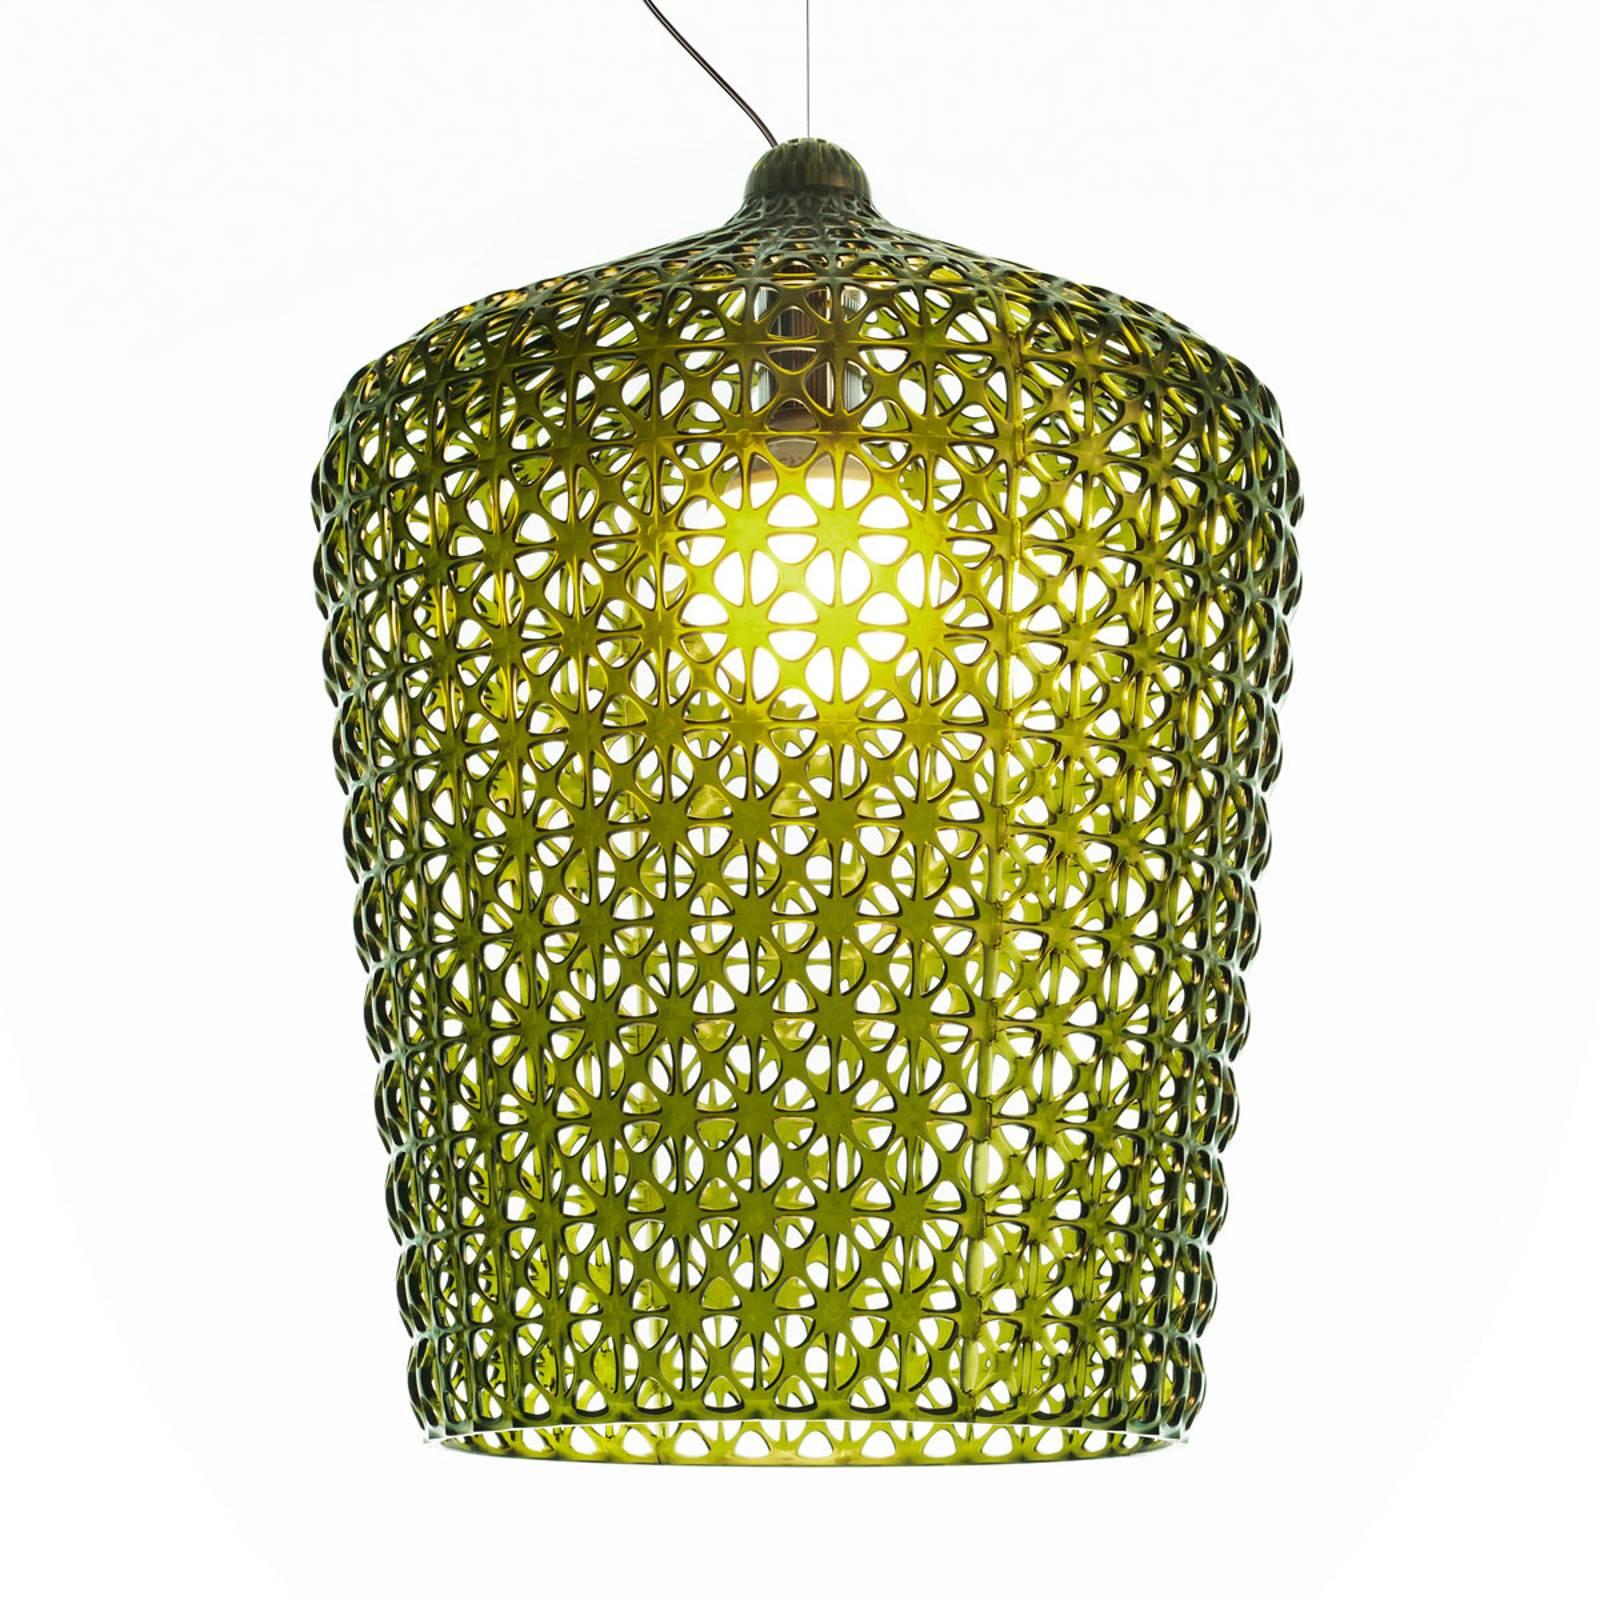 Designerska lampa wisząca Kabuki, zielona